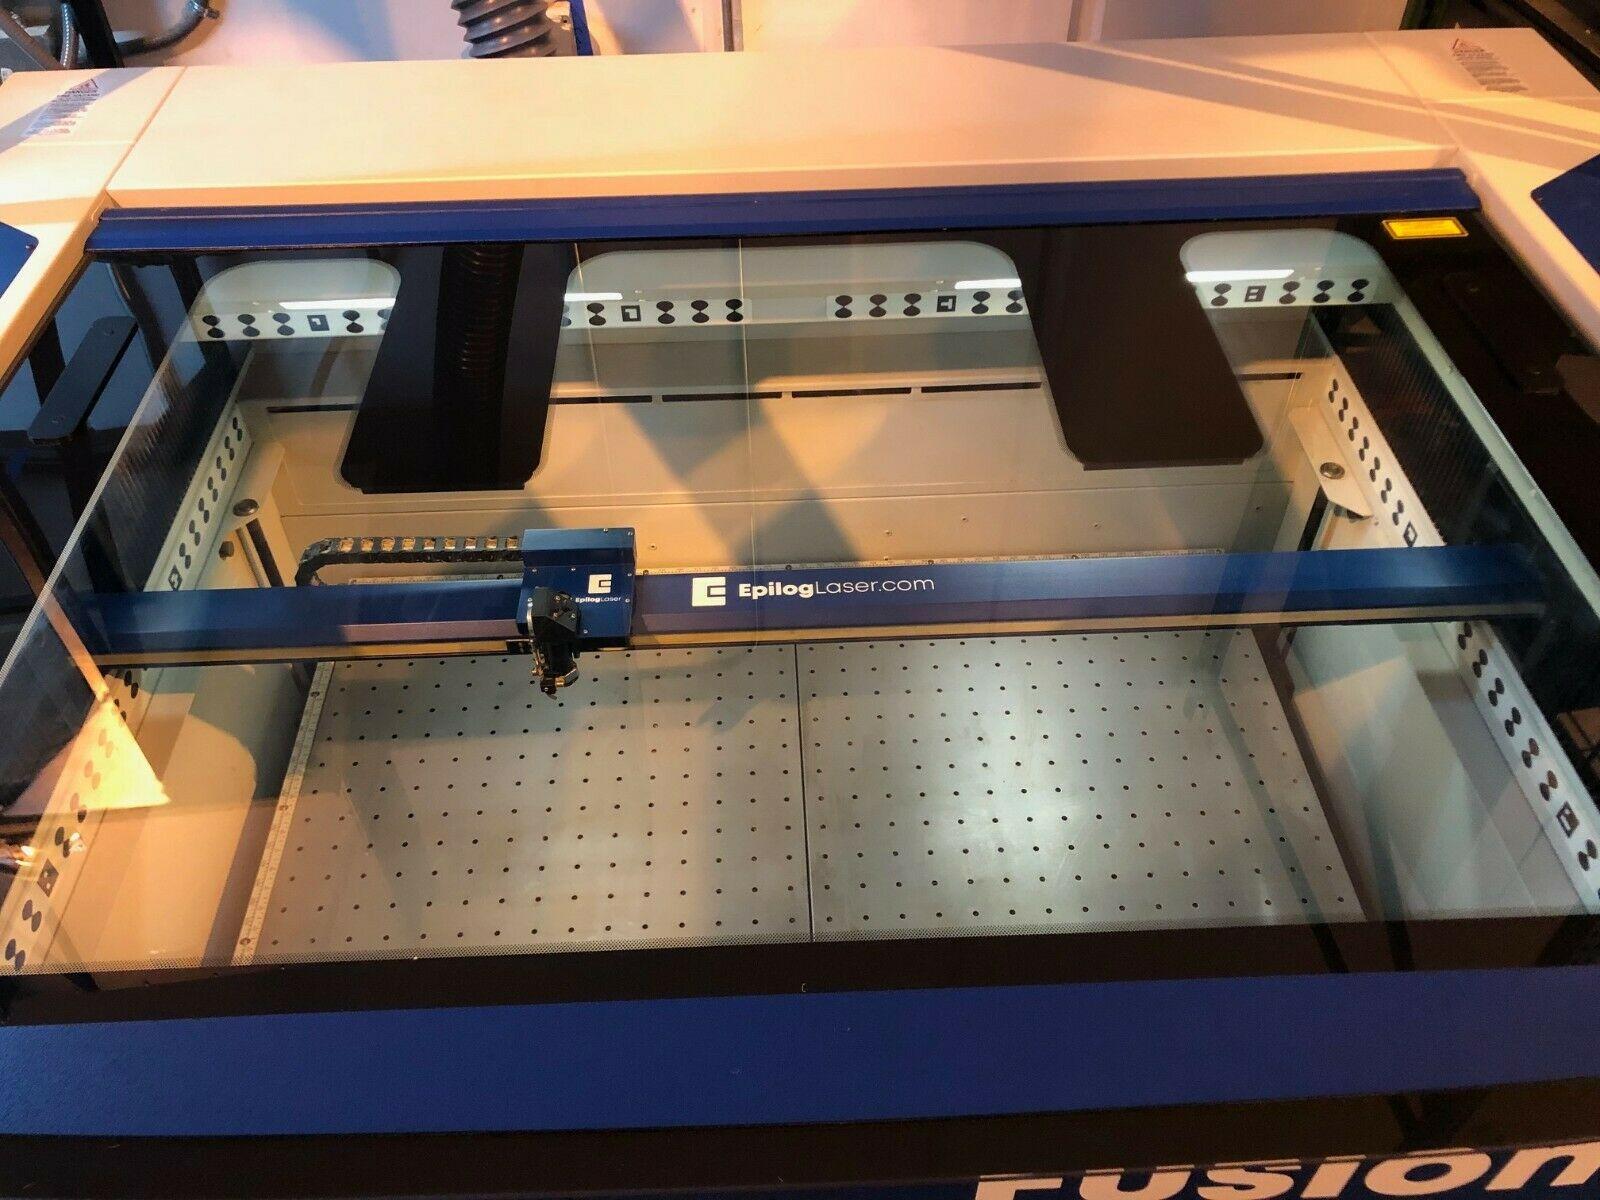 2019 Epilog Fusion Pro 48 50 Watt - Air Cooled High Performance Laser Engraver